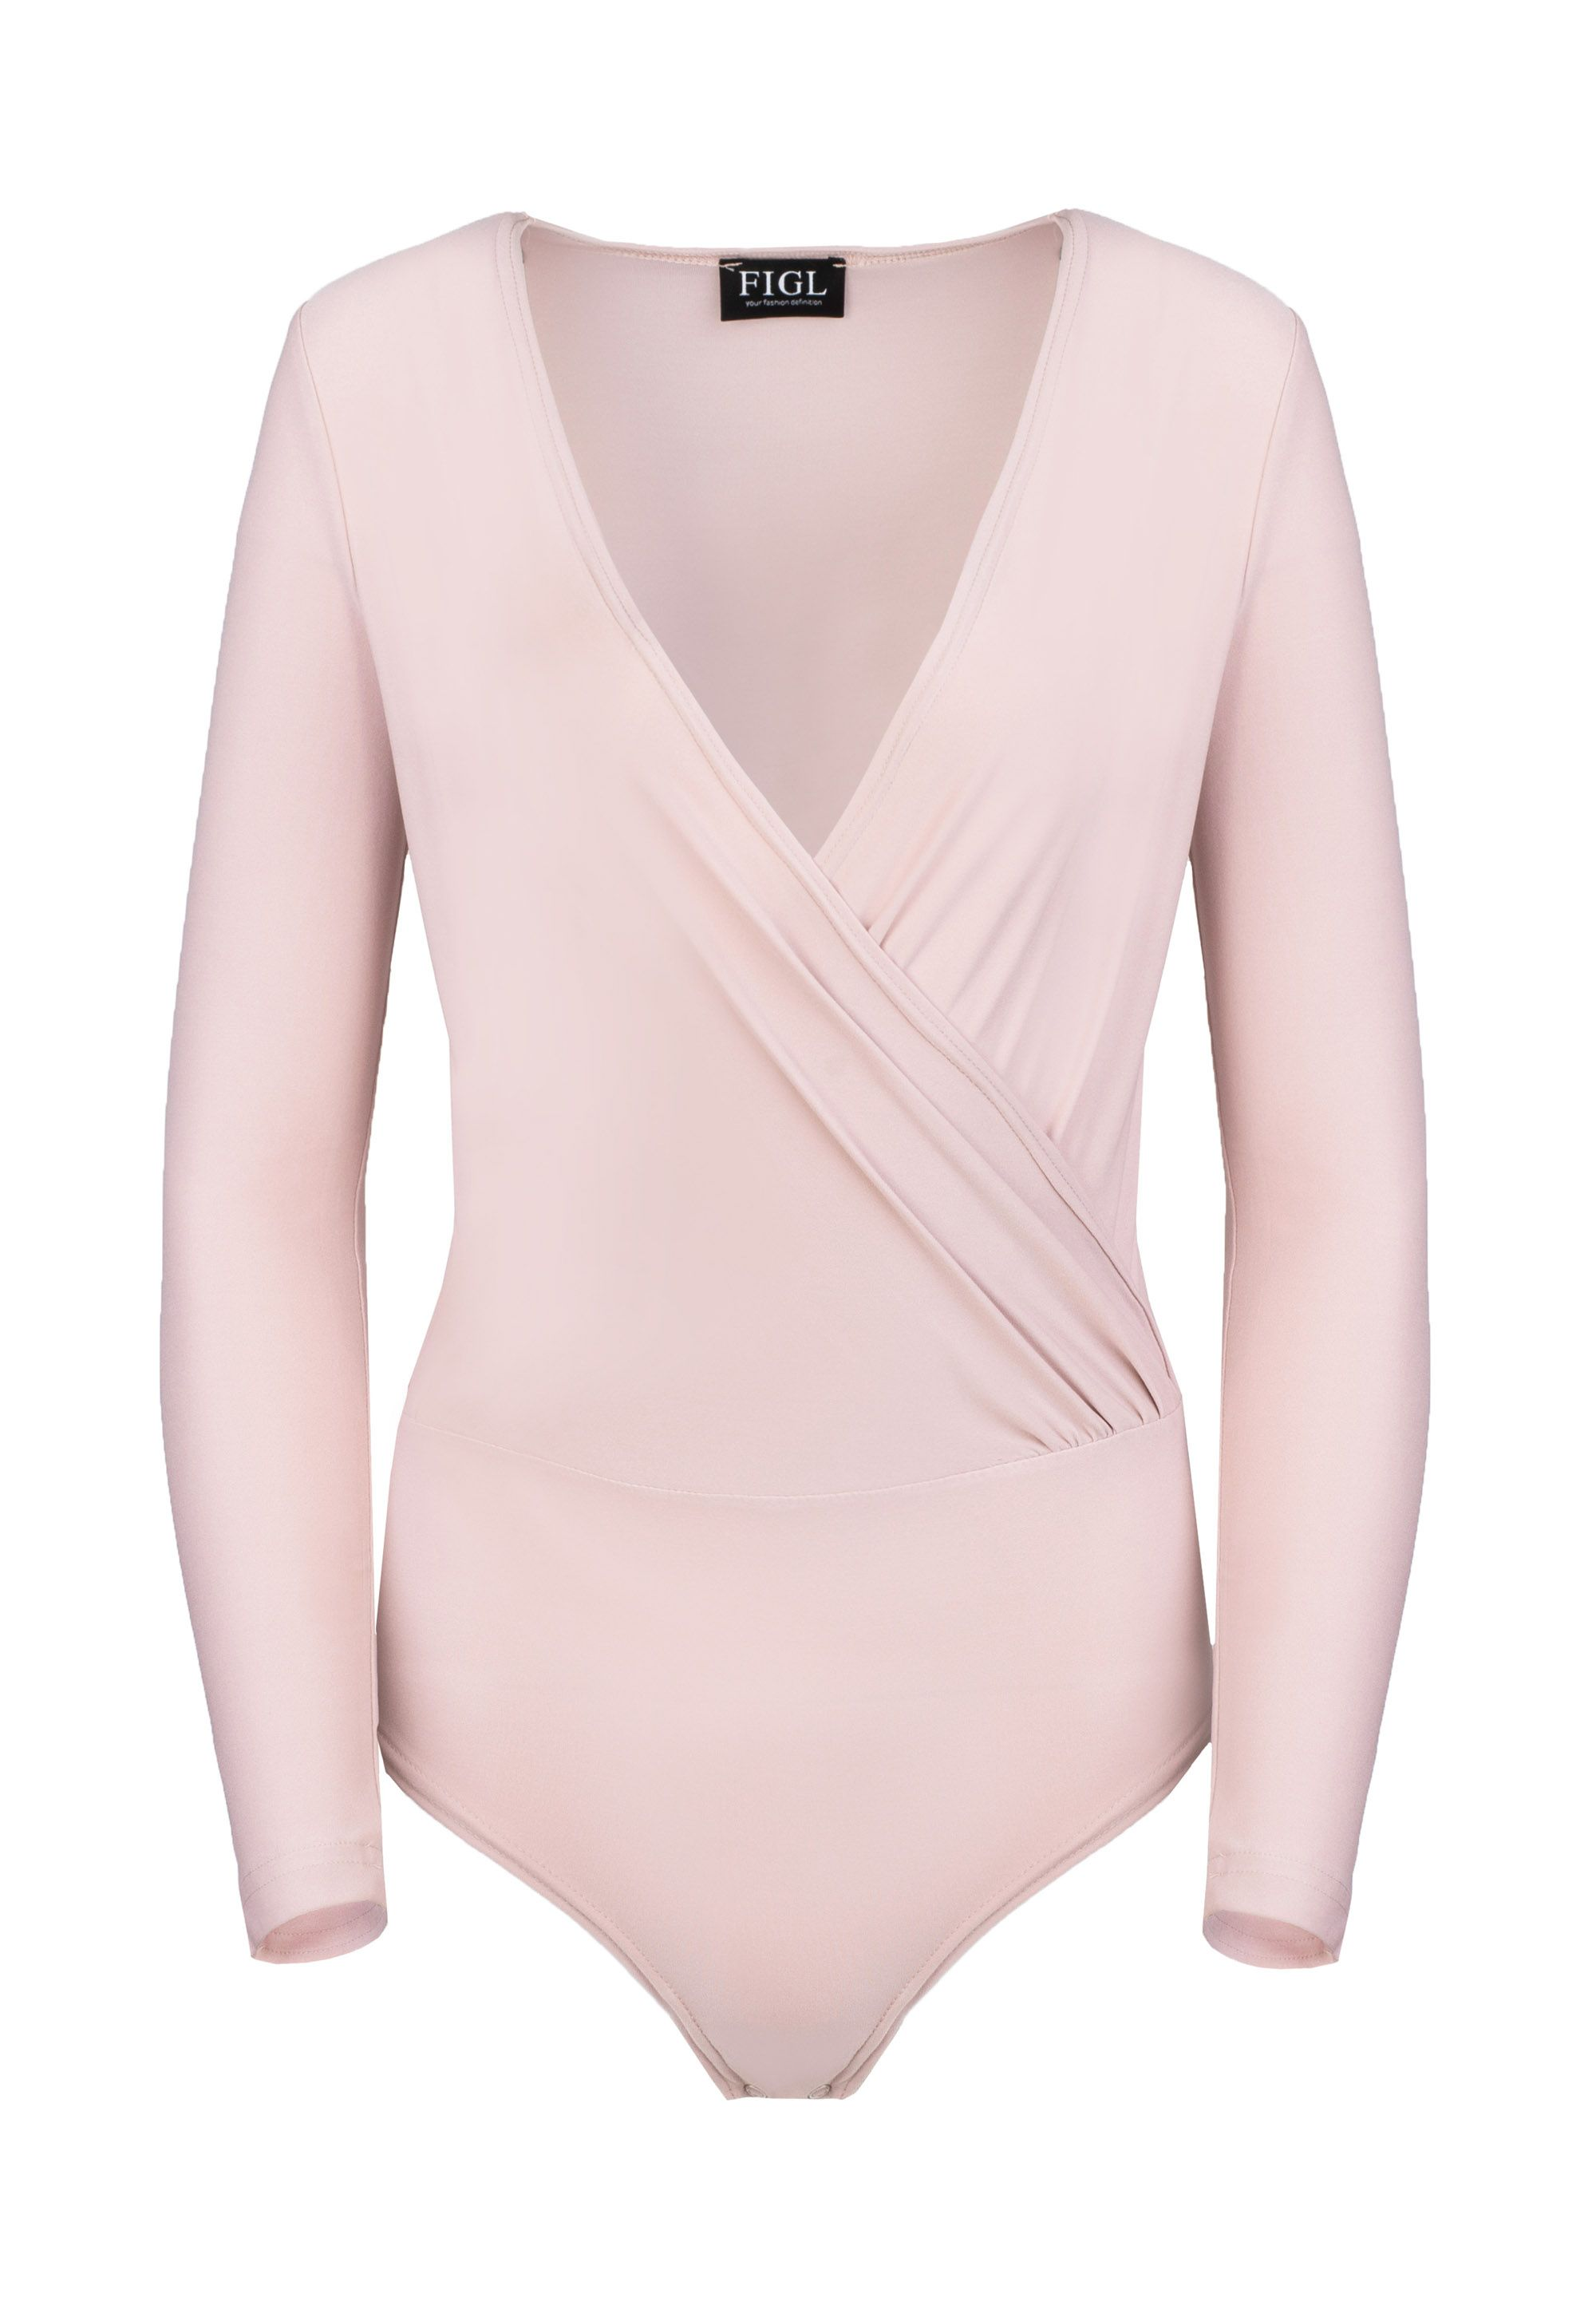 Pink Elegant Long-Sleeve Body